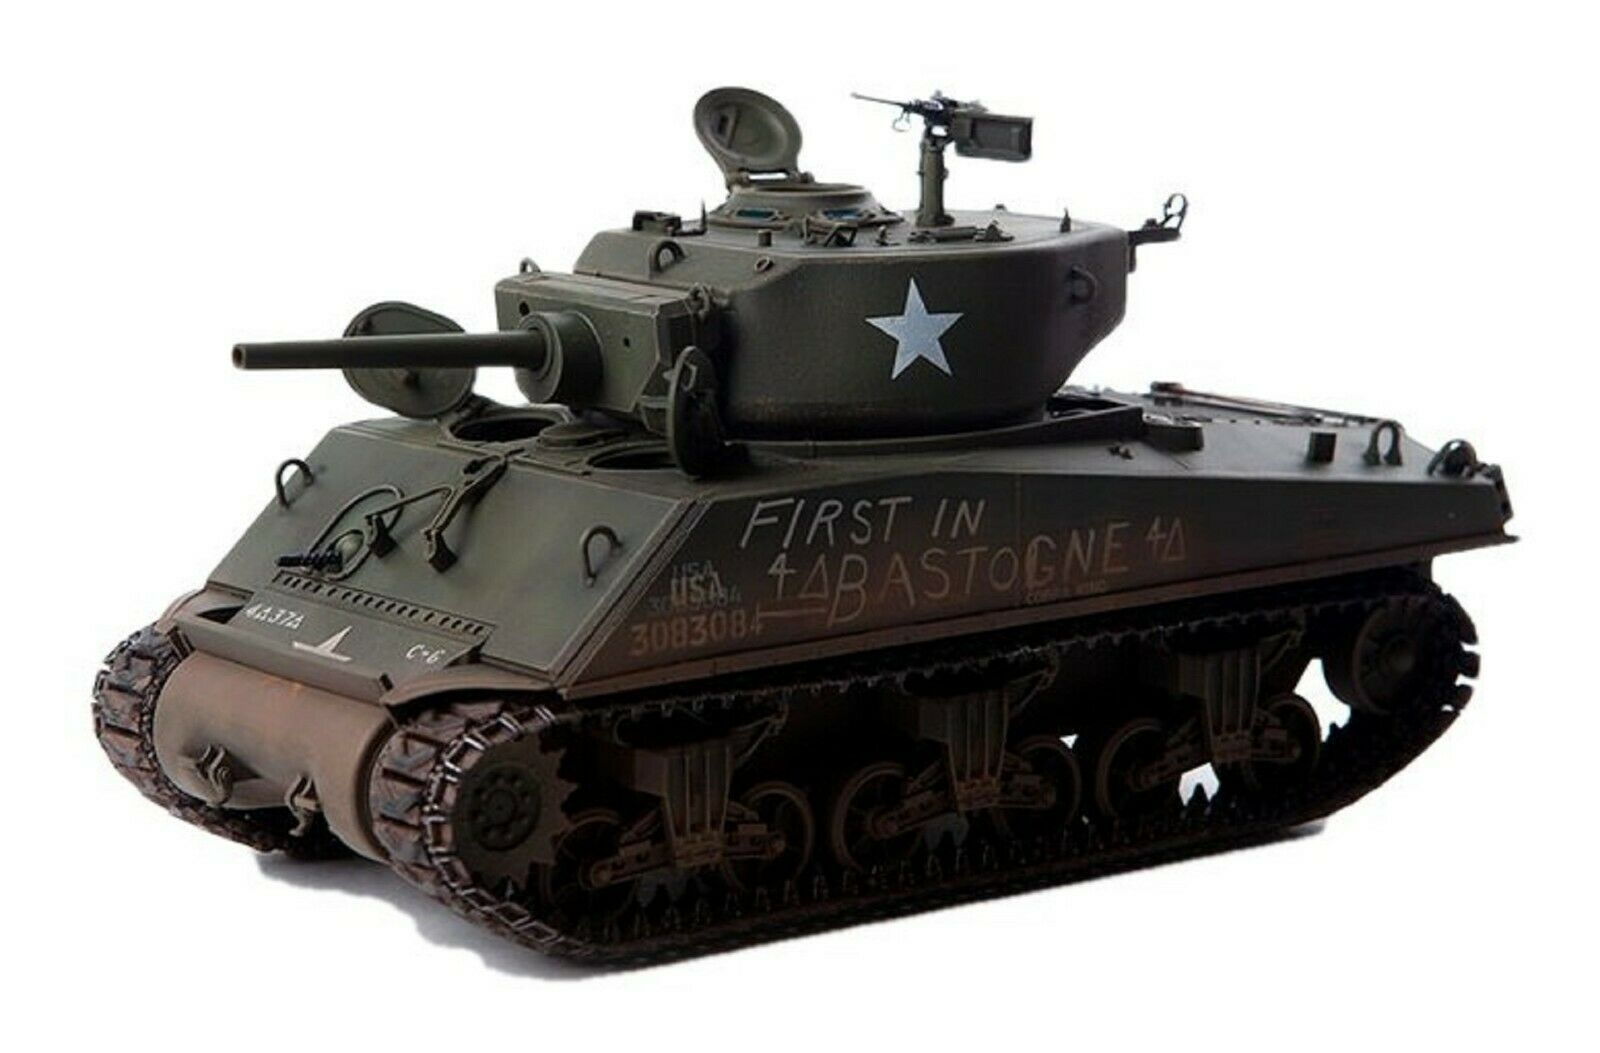 Academy 13527 US Army M4A3E2 Cobra King 1:35 Plamodel Plastic Hobby Model Tank